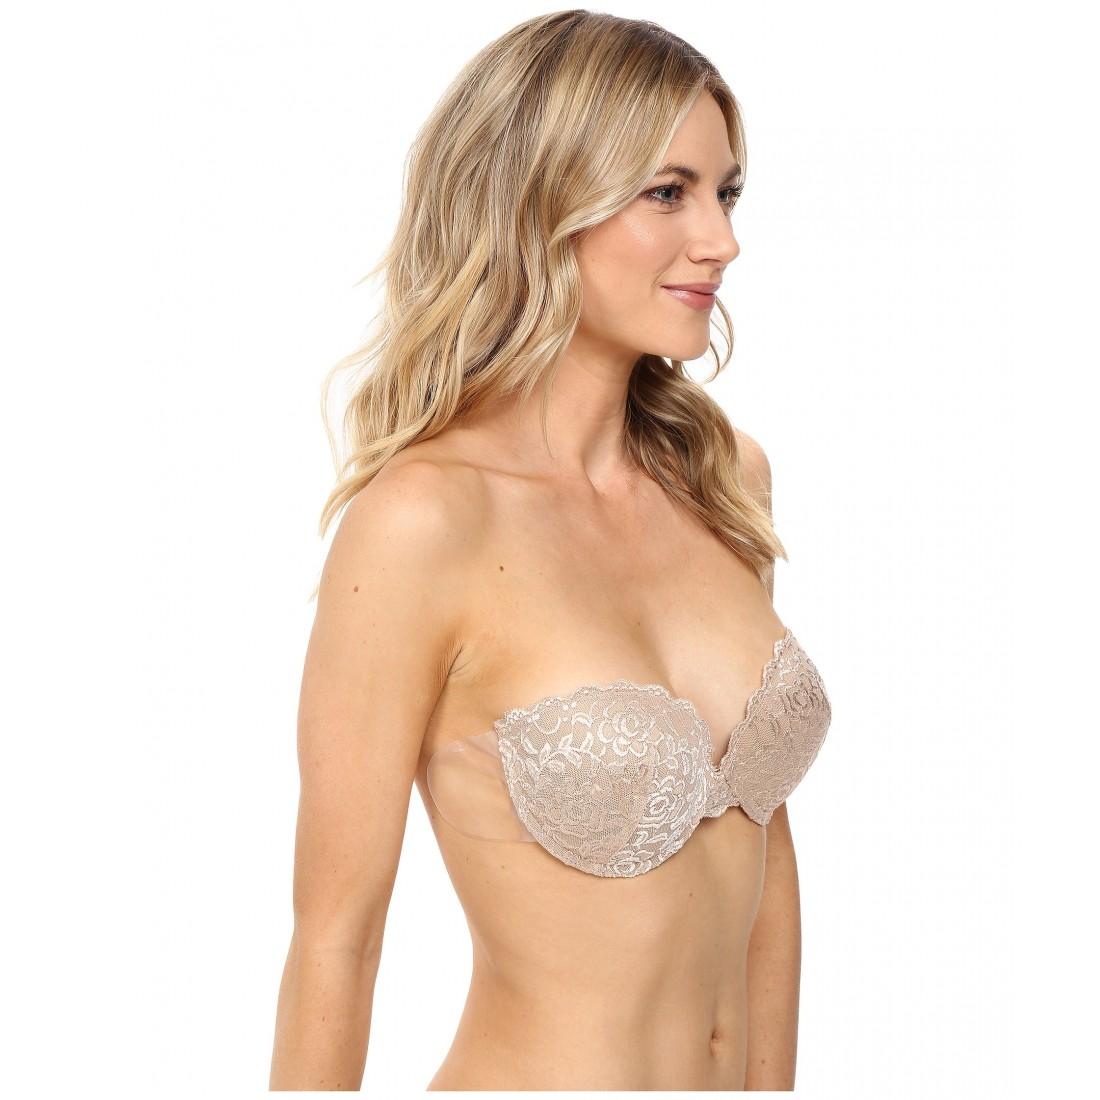 68d6ea327d1a2 Fashion Forms Lace Ultimate Boost Stick On Backless Strapless Bra ZPSKU  8839109 Blush